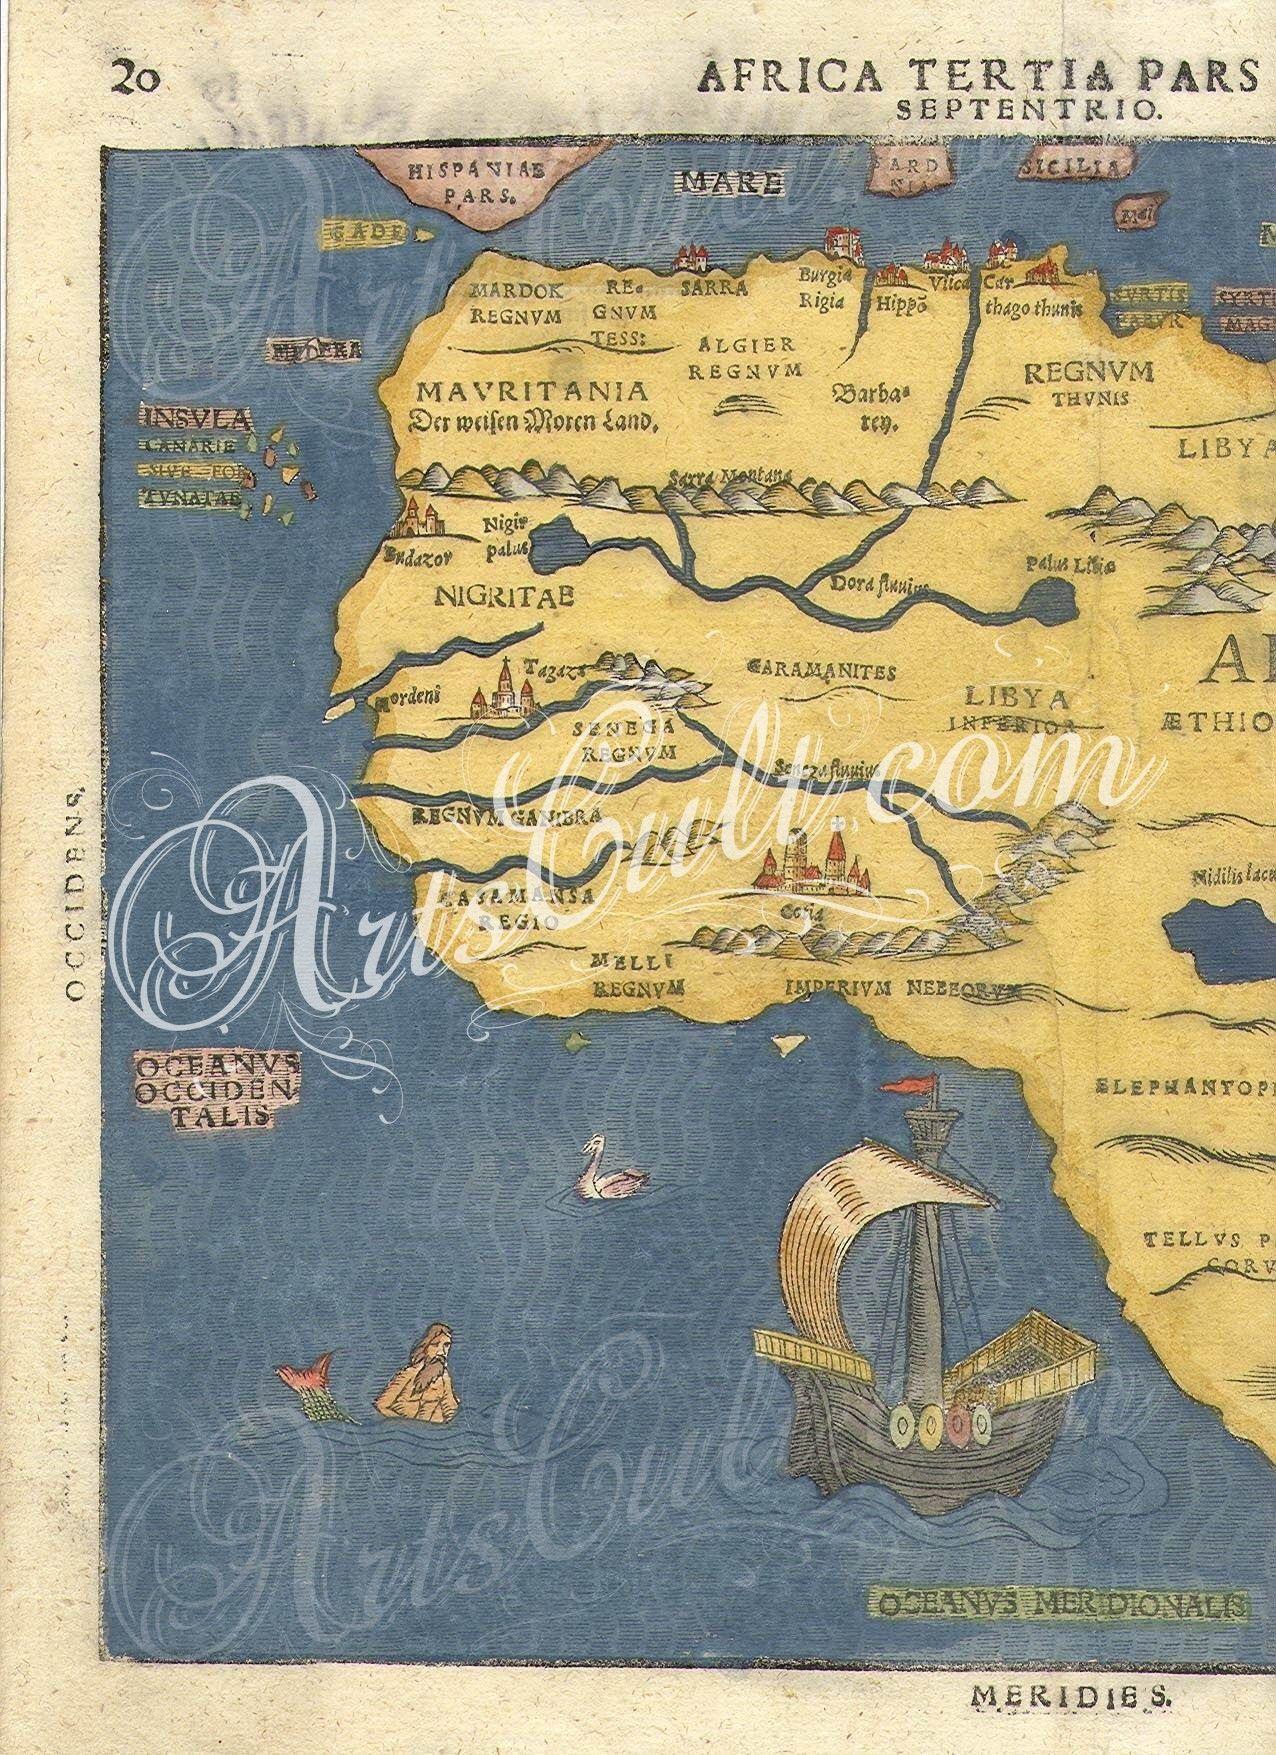 Buenting africa 3 artscult pinterest antique maps antique maps gumiabroncs Gallery